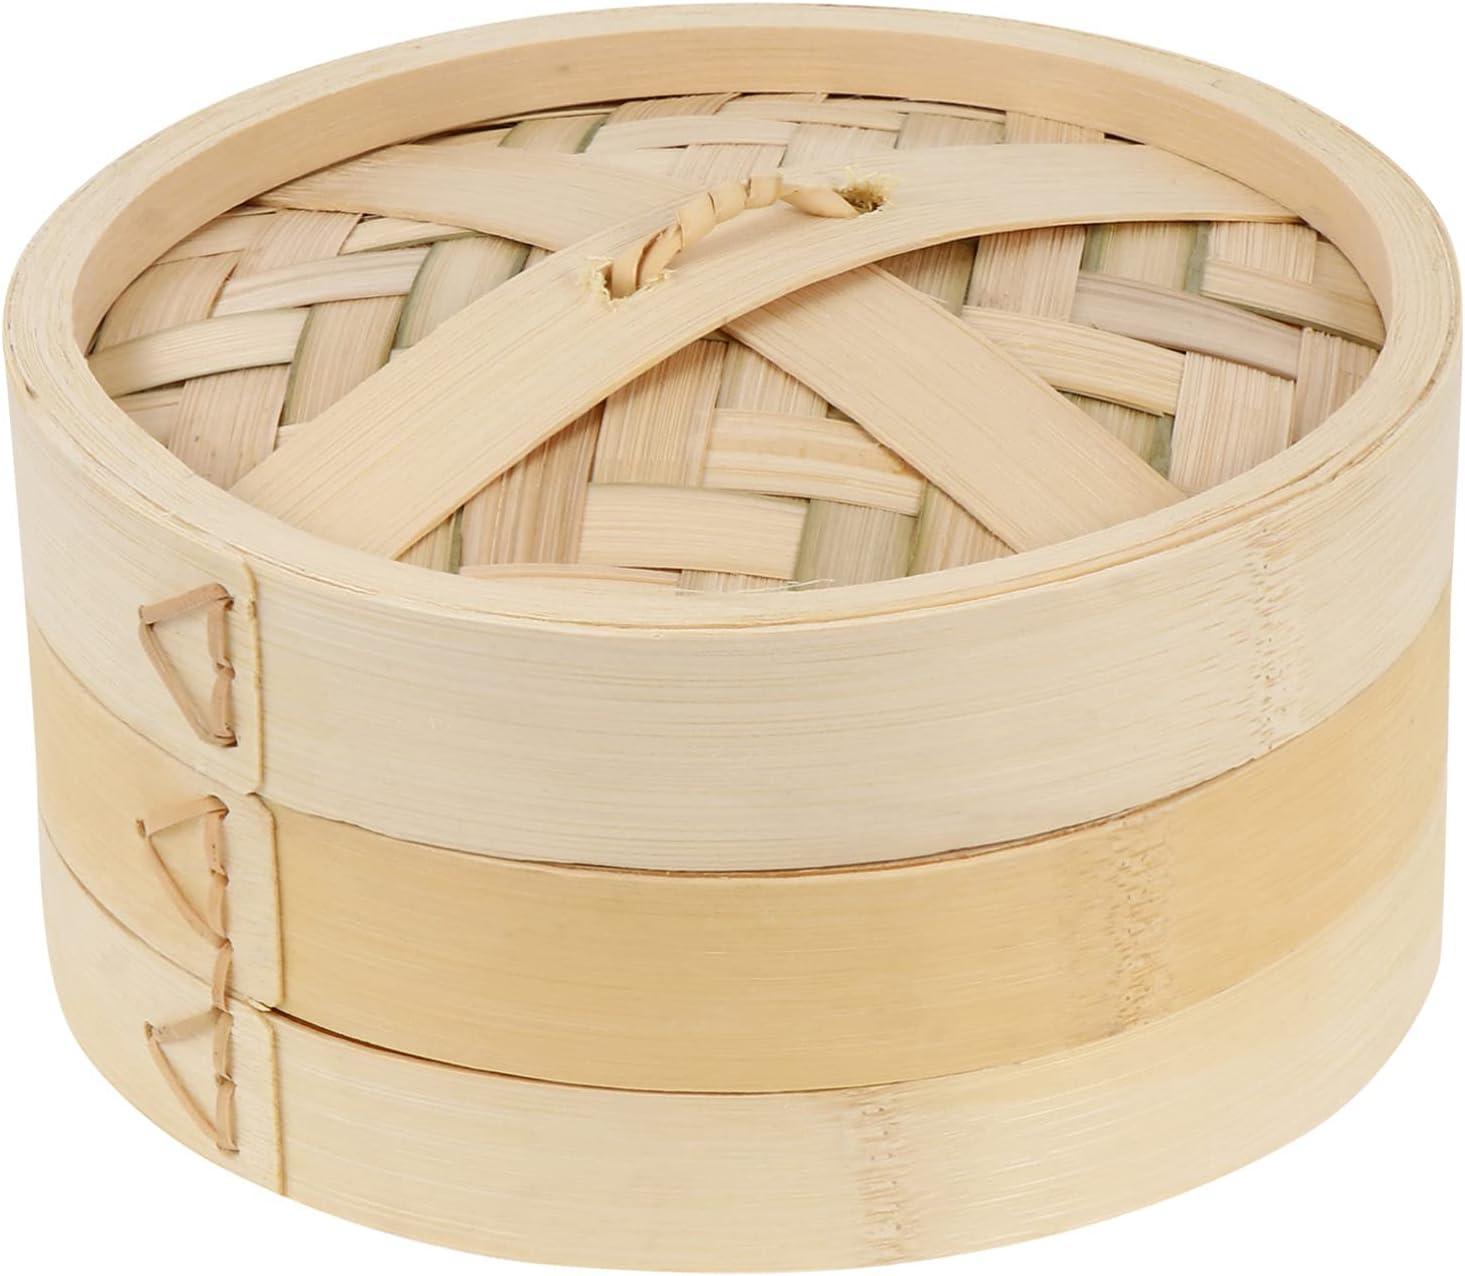 HEMOTON Bamboo Steamer Basket with Max 42% OFF Dumpling Buns Lid Kit Spring new work